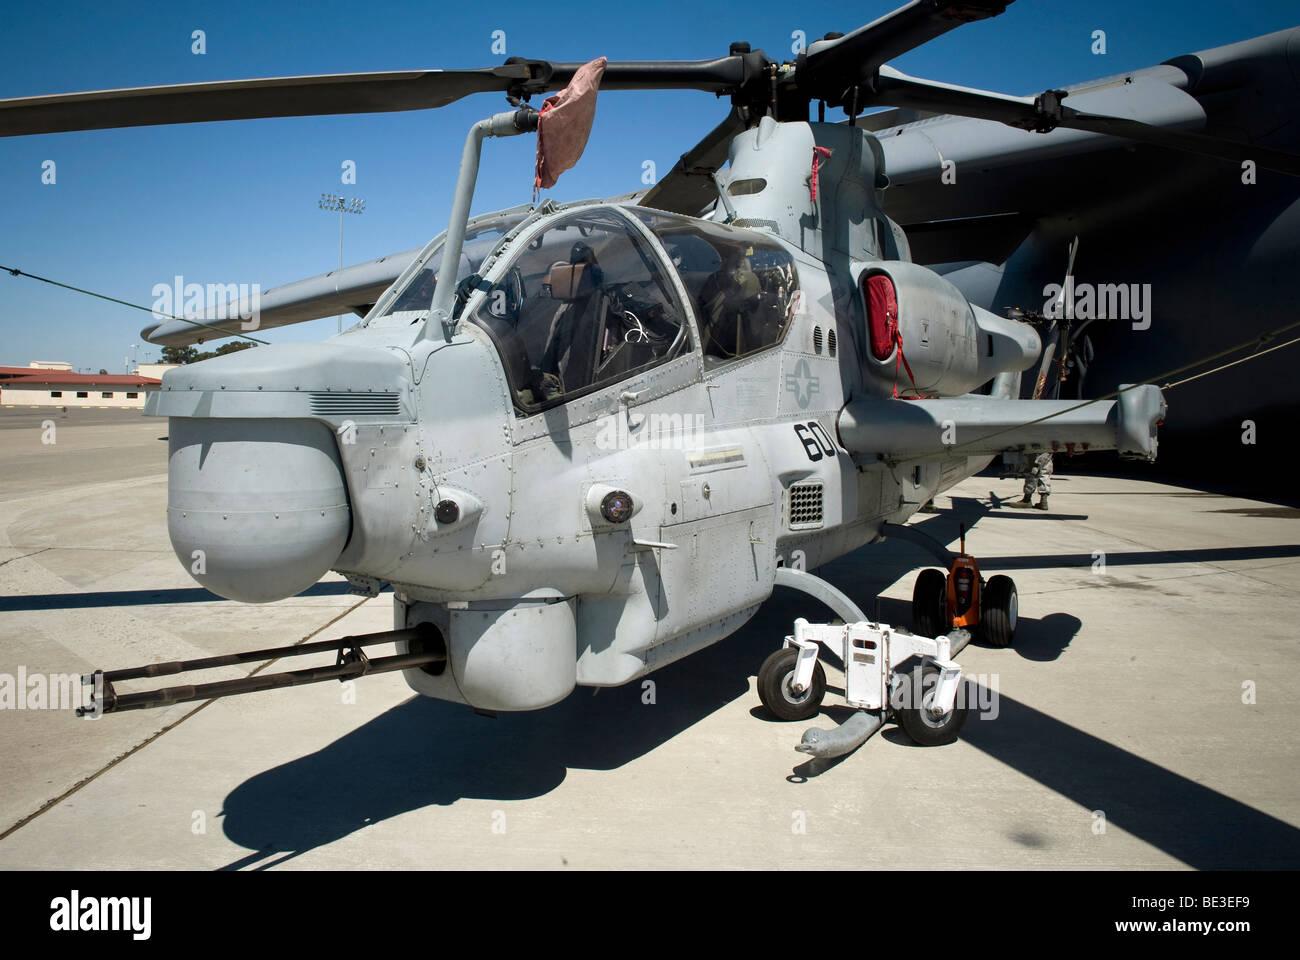 AH-1Z Super Cobra attack helicopter. - Stock Image